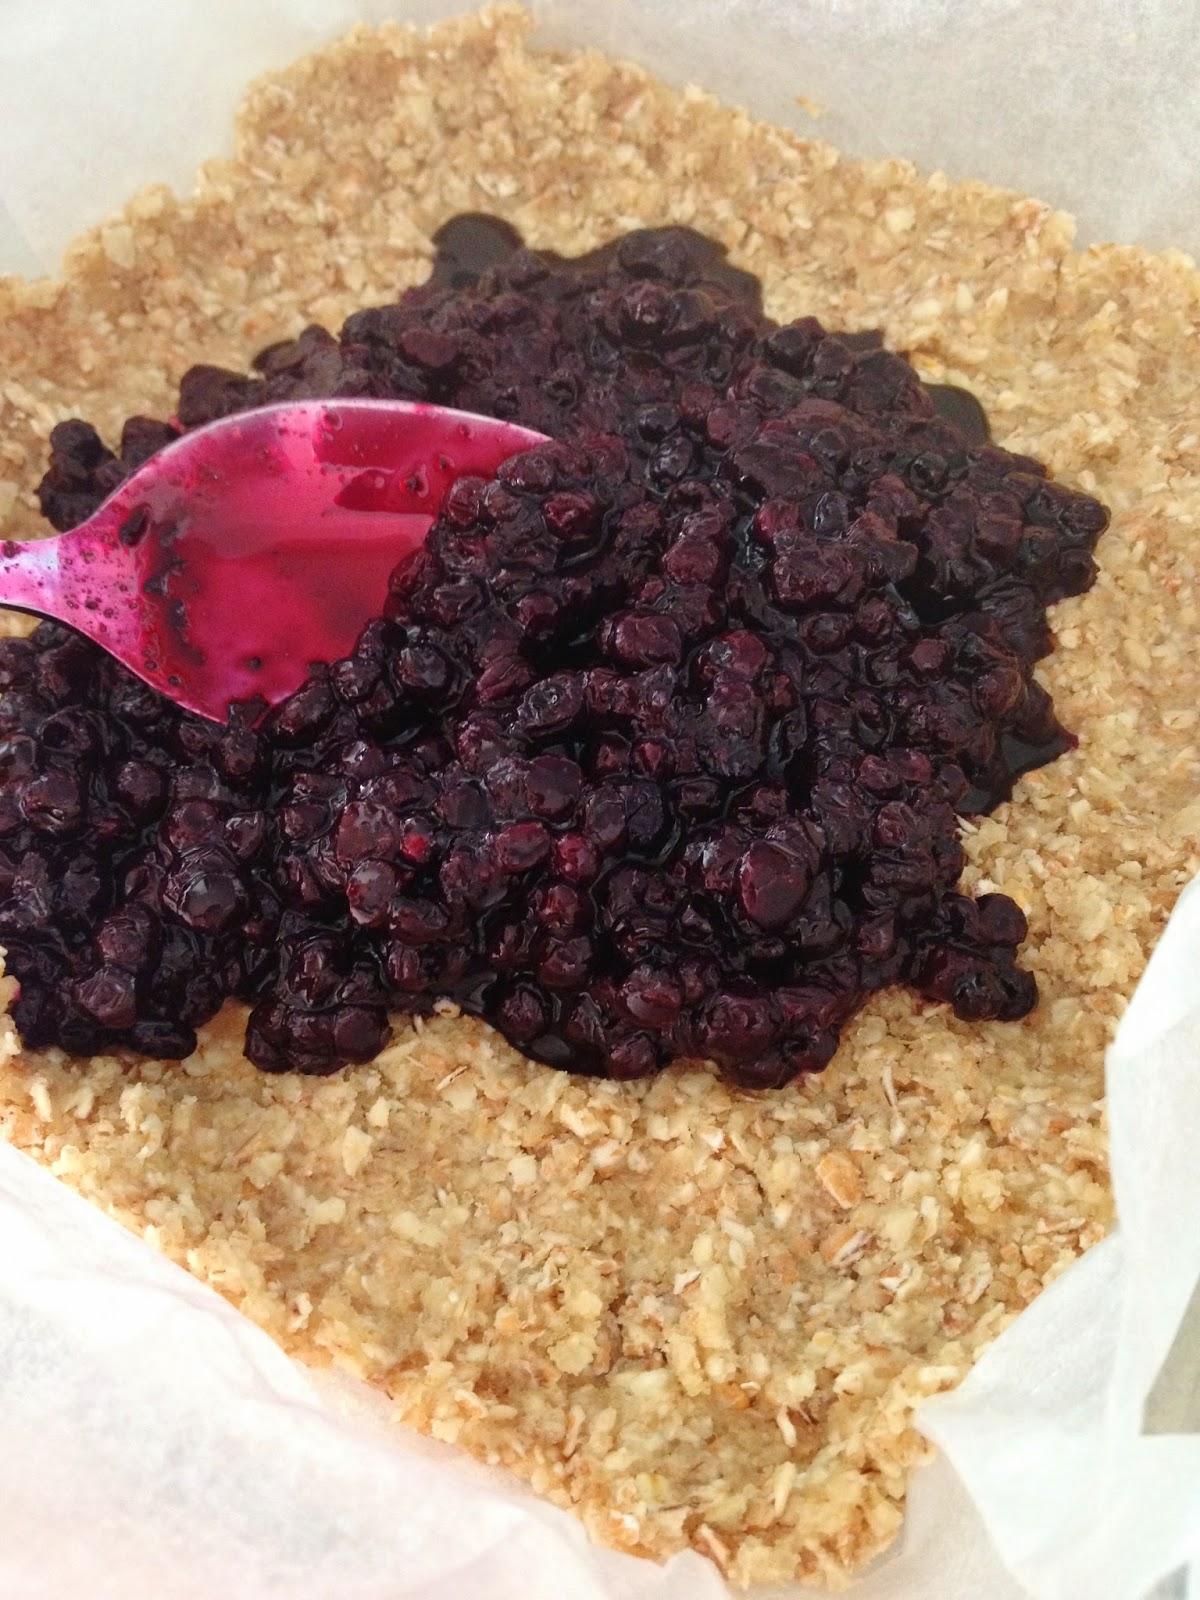 Sweet Kwisine, carrés, myrtilles, tarte, blueberry squares, oatmeal, flocons d'avoine